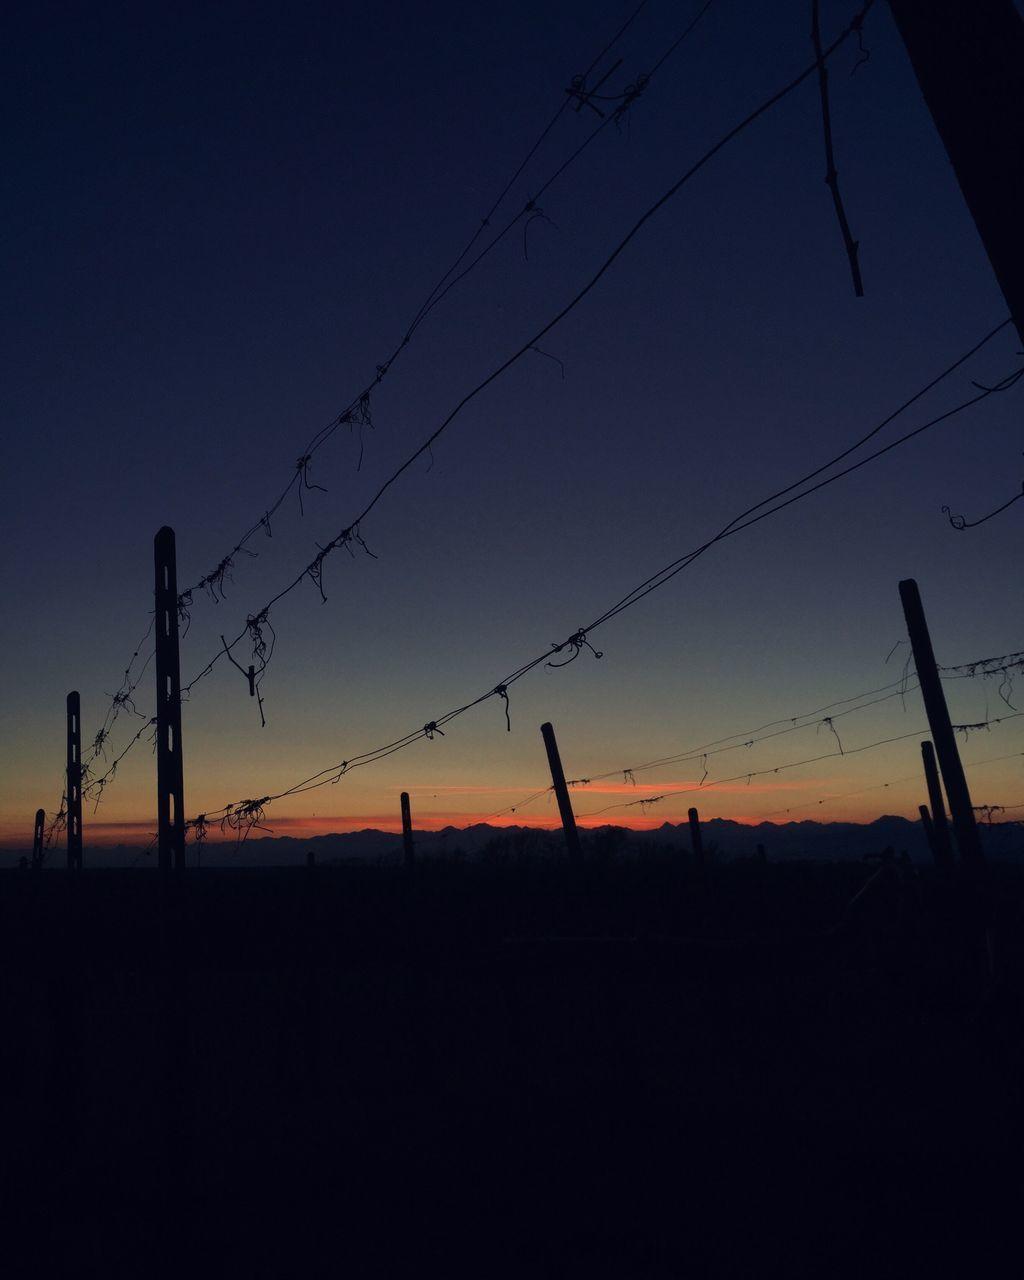 sunset, silhouette, cable, orange color, connection, nature, power line, sky, electricity pylon, beauty in nature, electricity, power supply, outdoors, no people, landscape, telephone line, scenics, clear sky